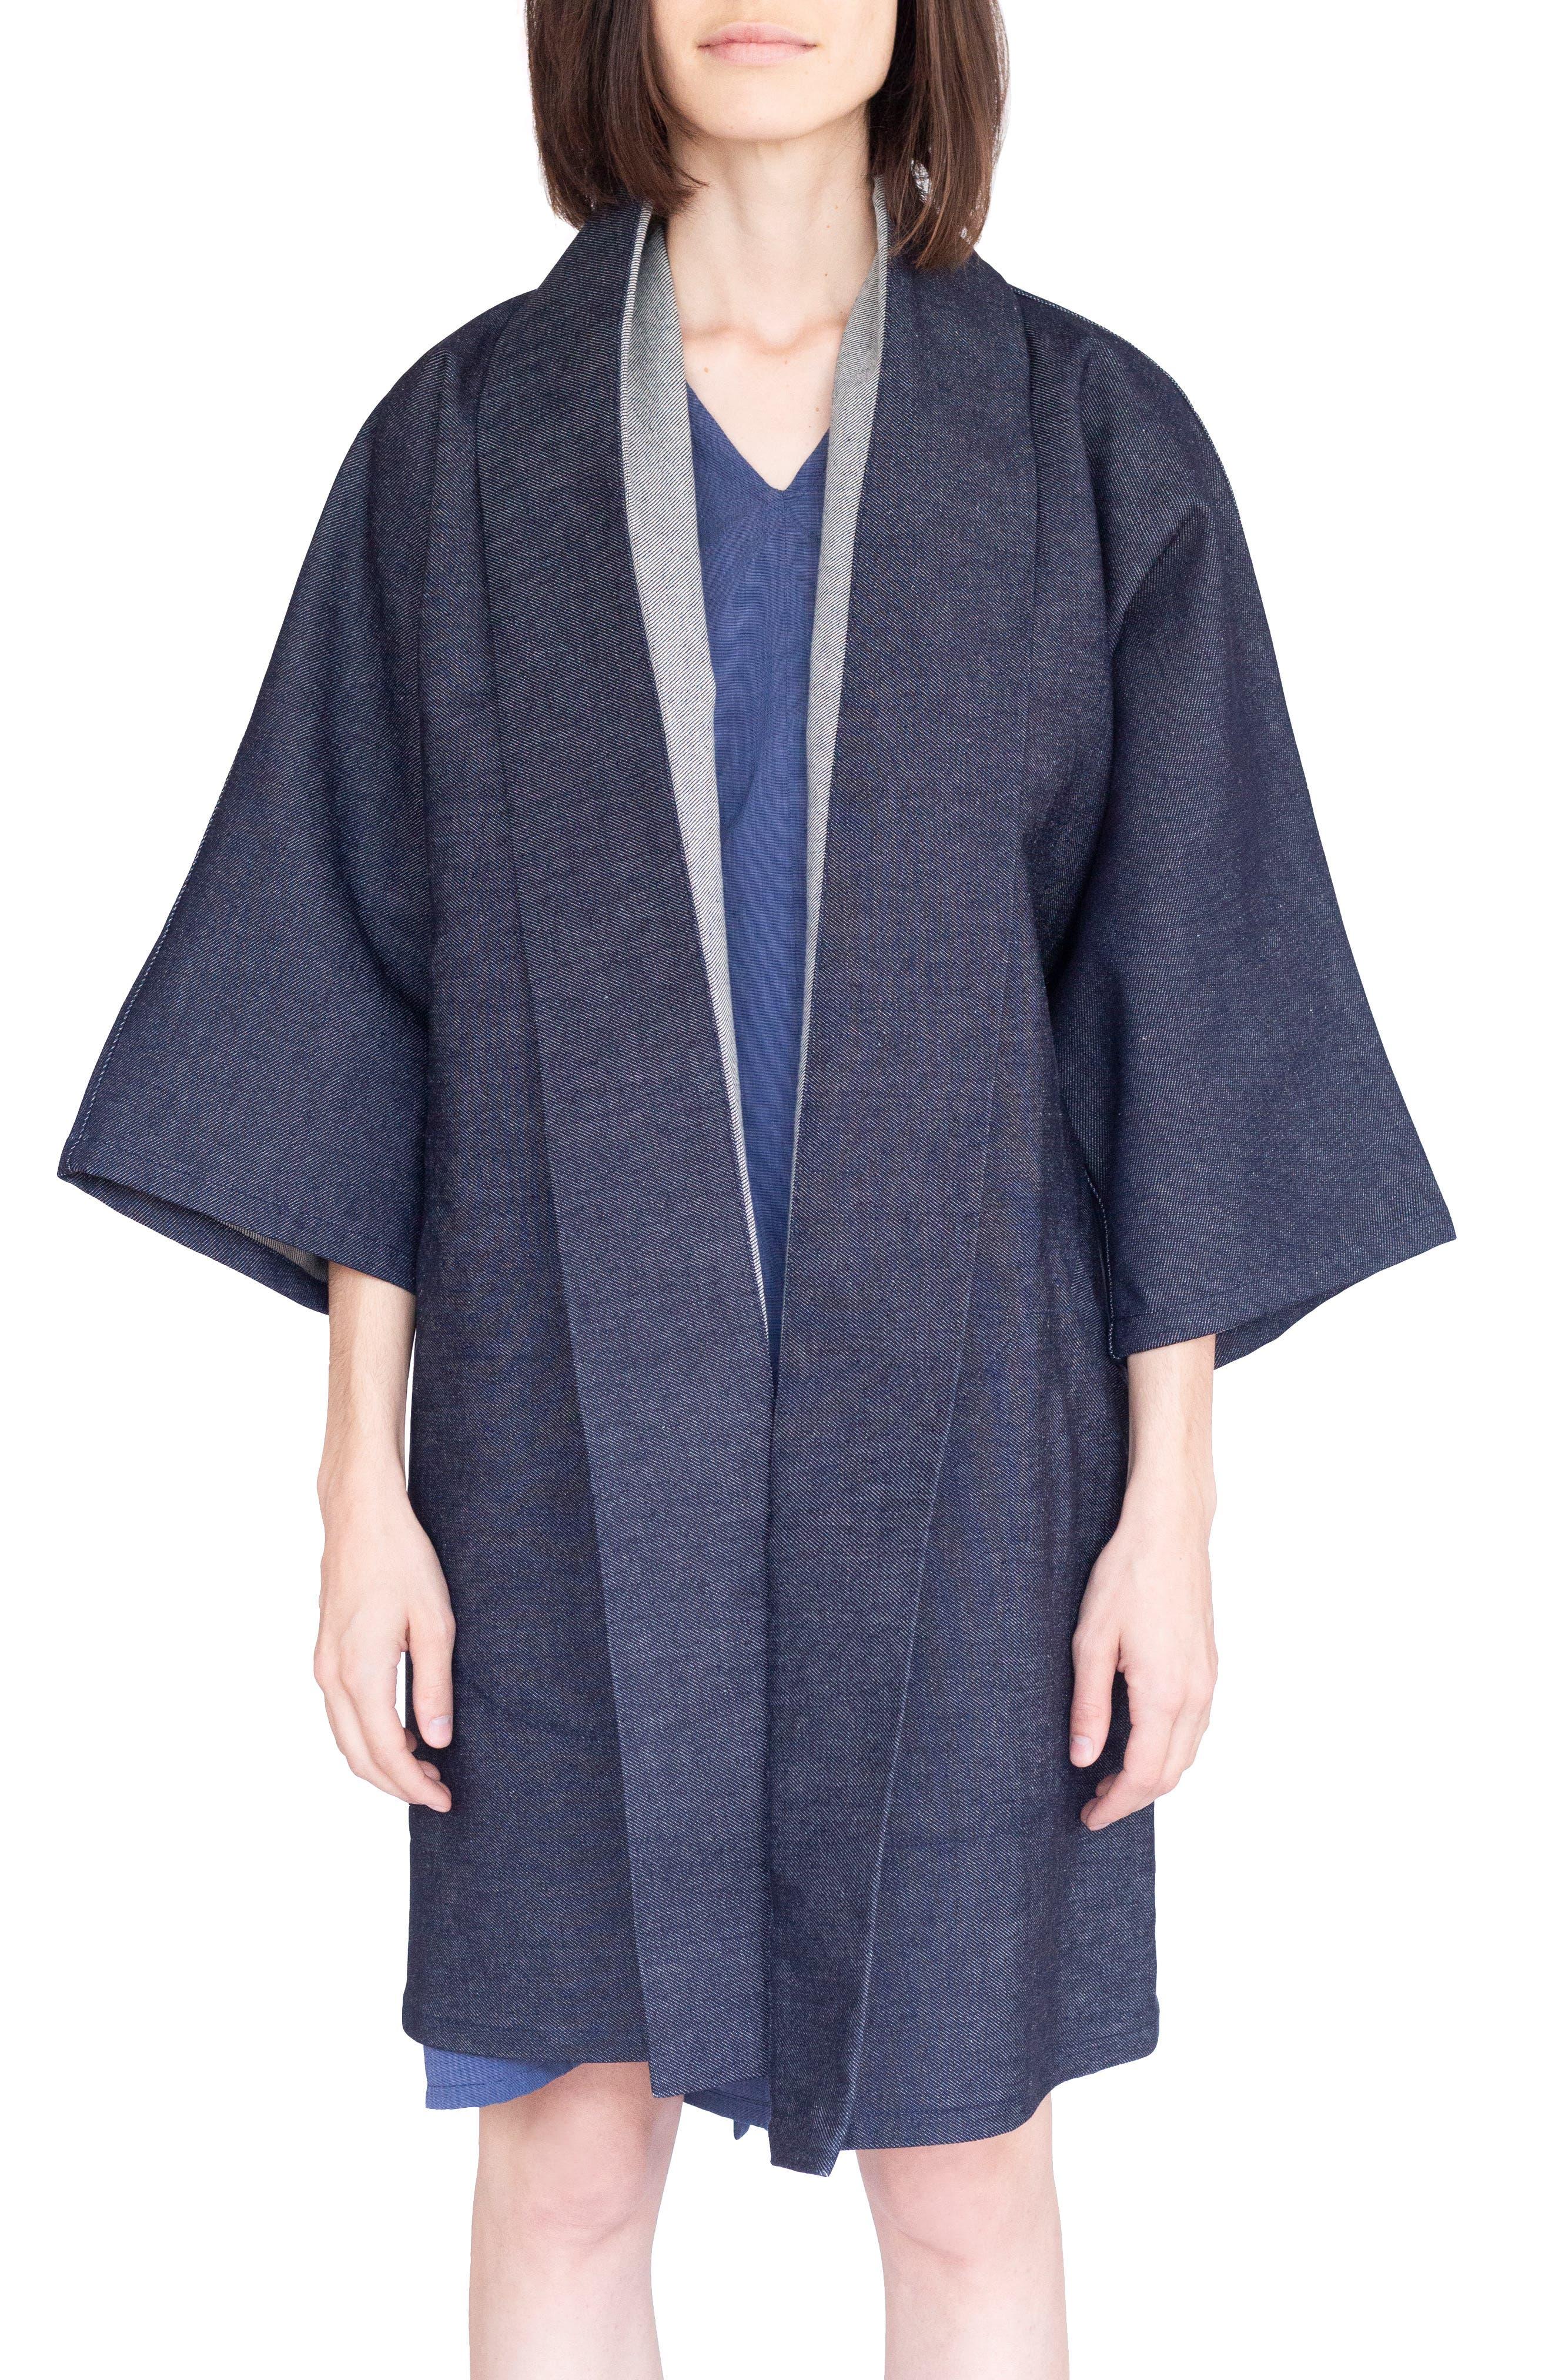 Vintage Coats & Jackets | Retro Coats and Jackets Womens Simple By Trista Oversized Denim Kimono Coat Size LargeX-Large - Blue $258.00 AT vintagedancer.com